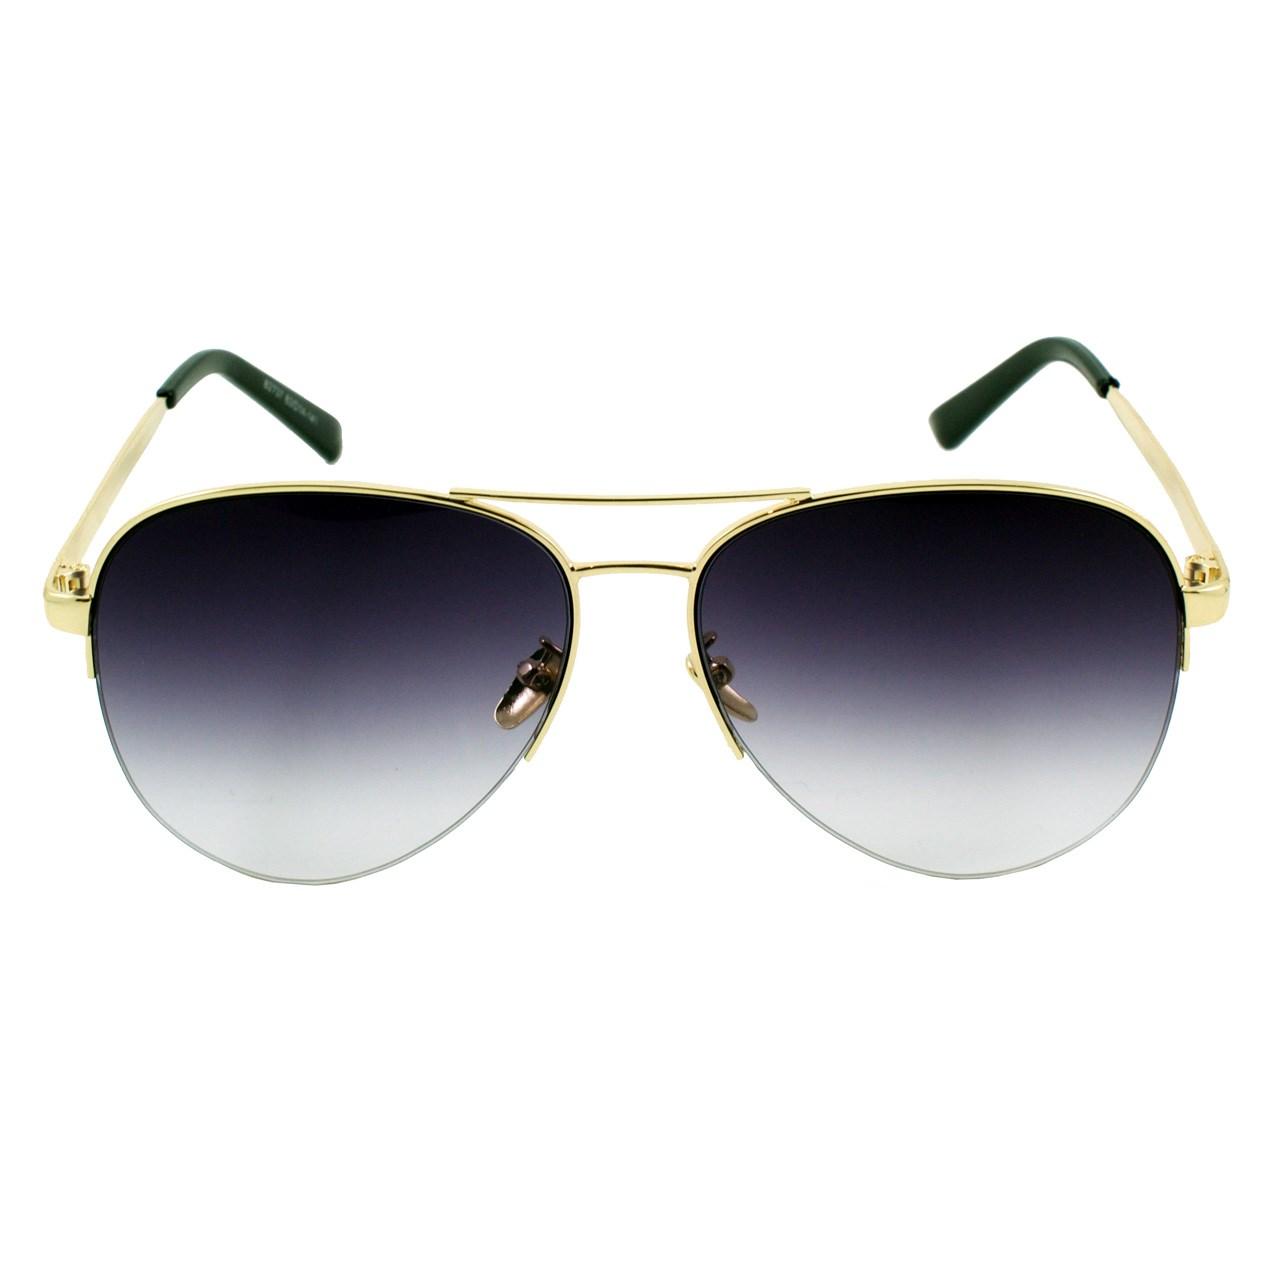 قیمت عینک آفتابی ویلی بولو مدل Liberty Grey Aviators